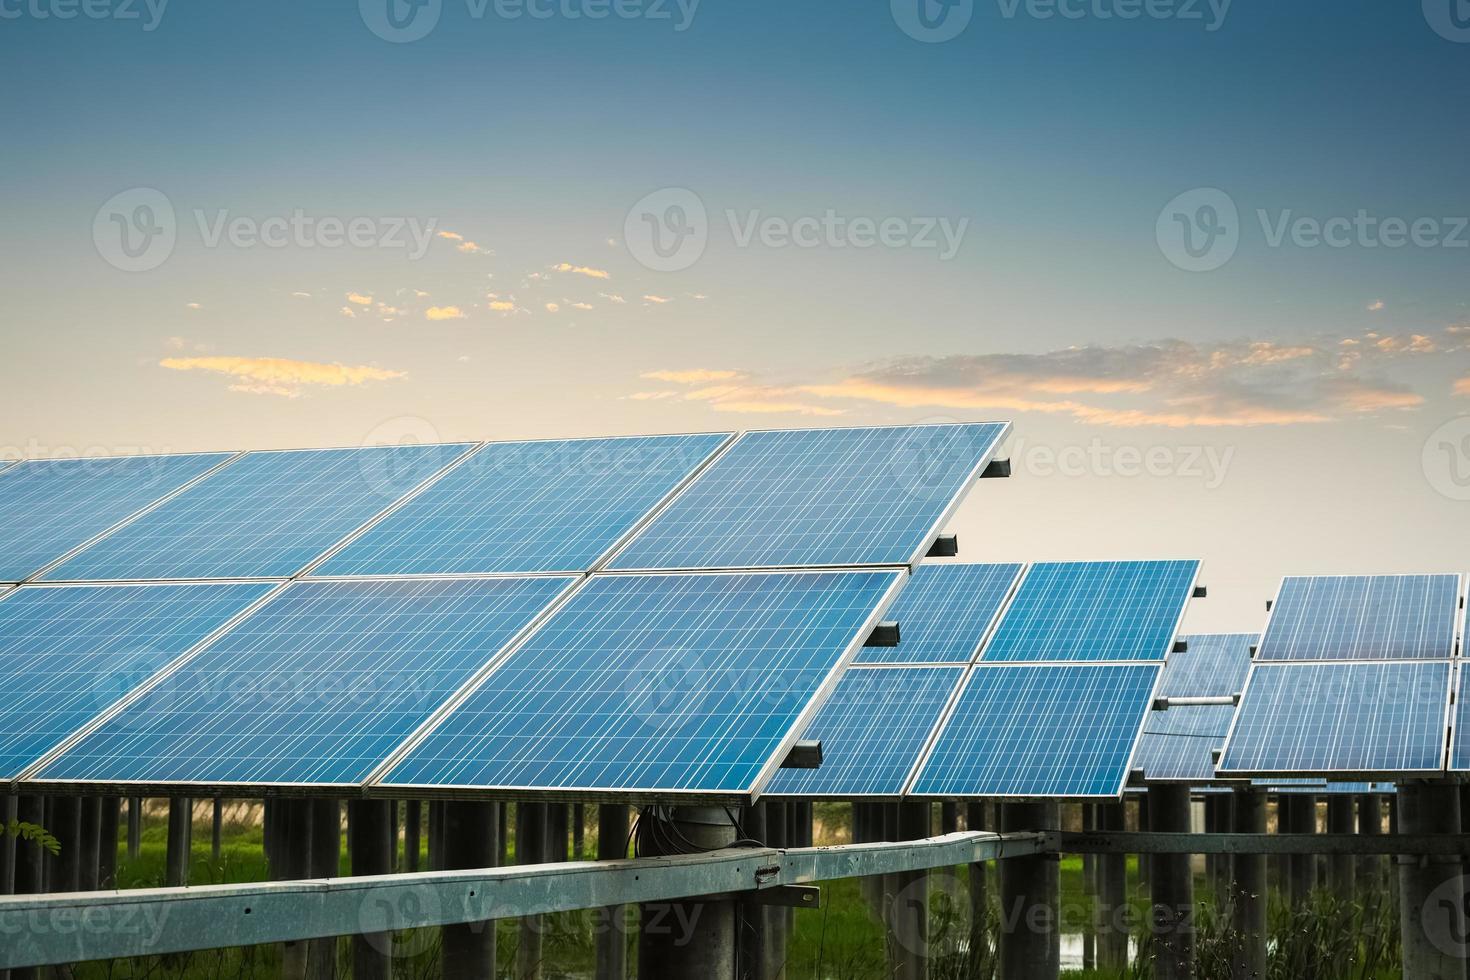 fazenda solar ao entardecer foto